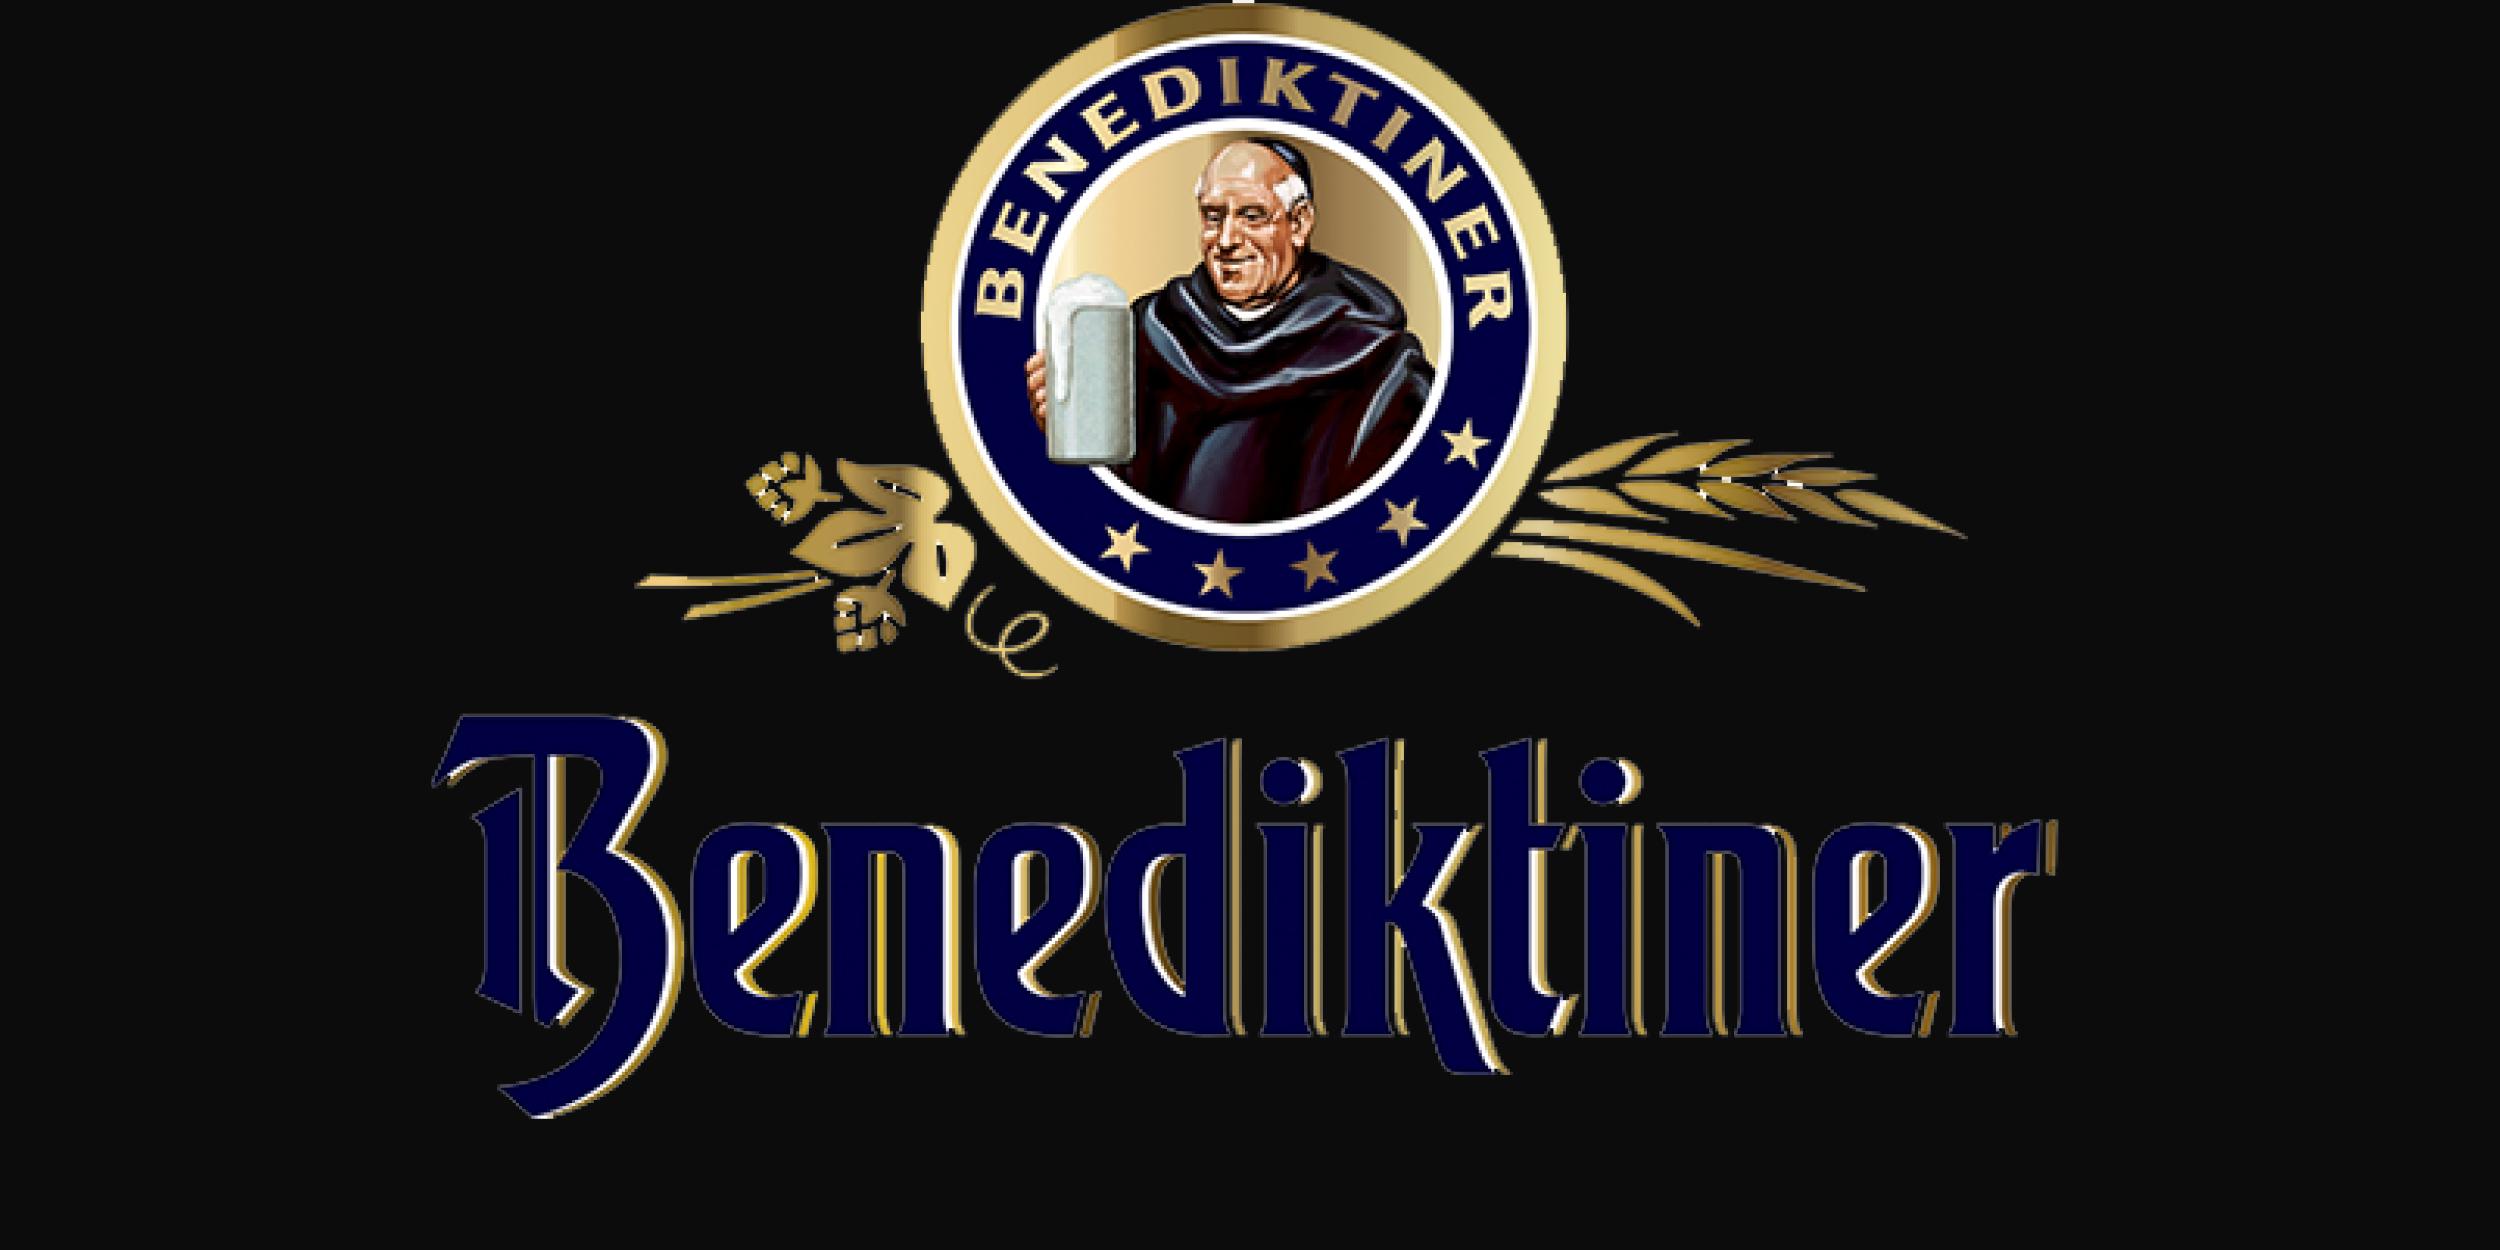 Referenz Benediktiner Bier Team Bitburger